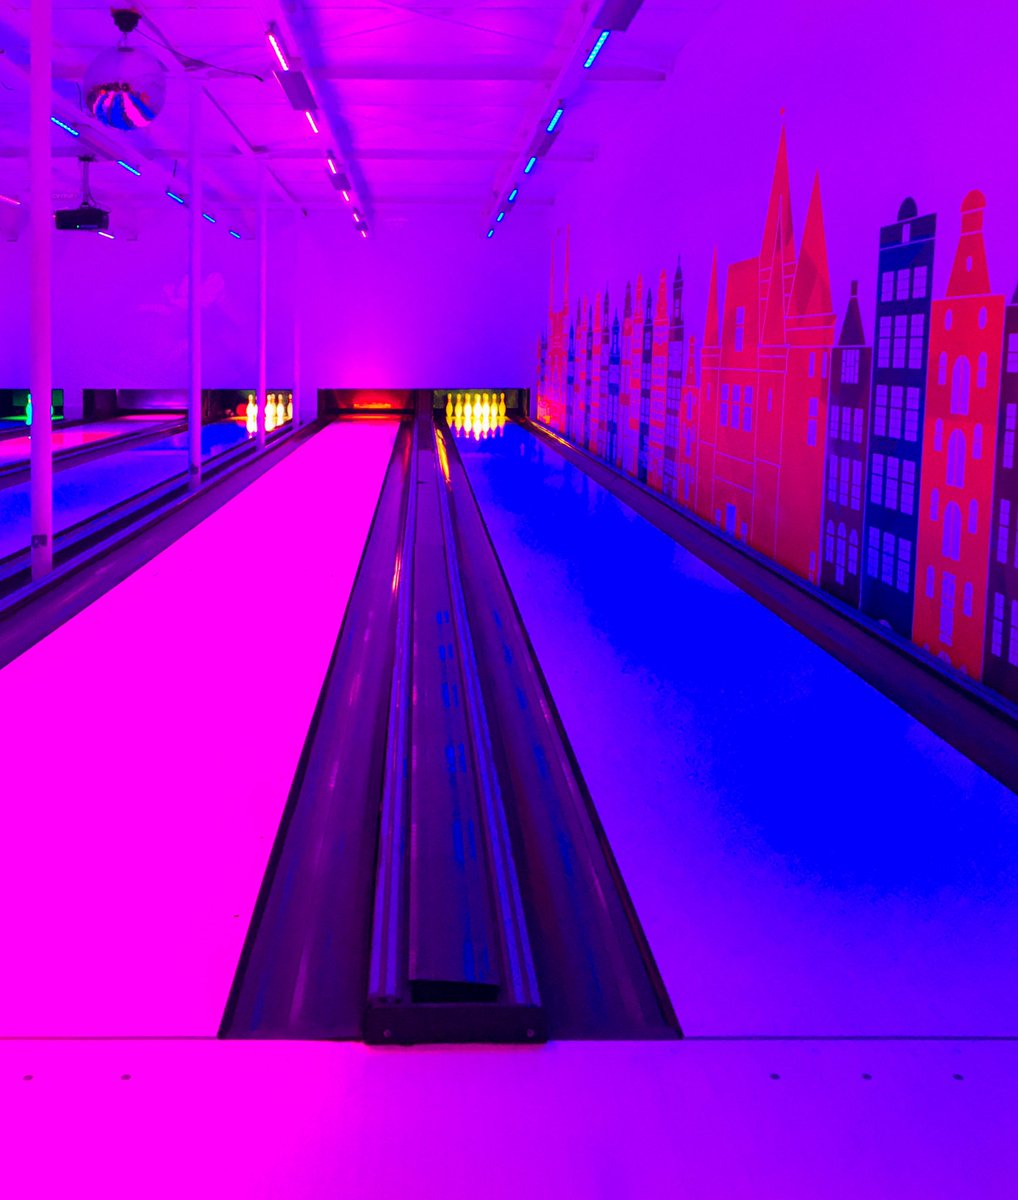 #bowling #powerzone #amsterdam #blue #purple #pink @rjpreigns